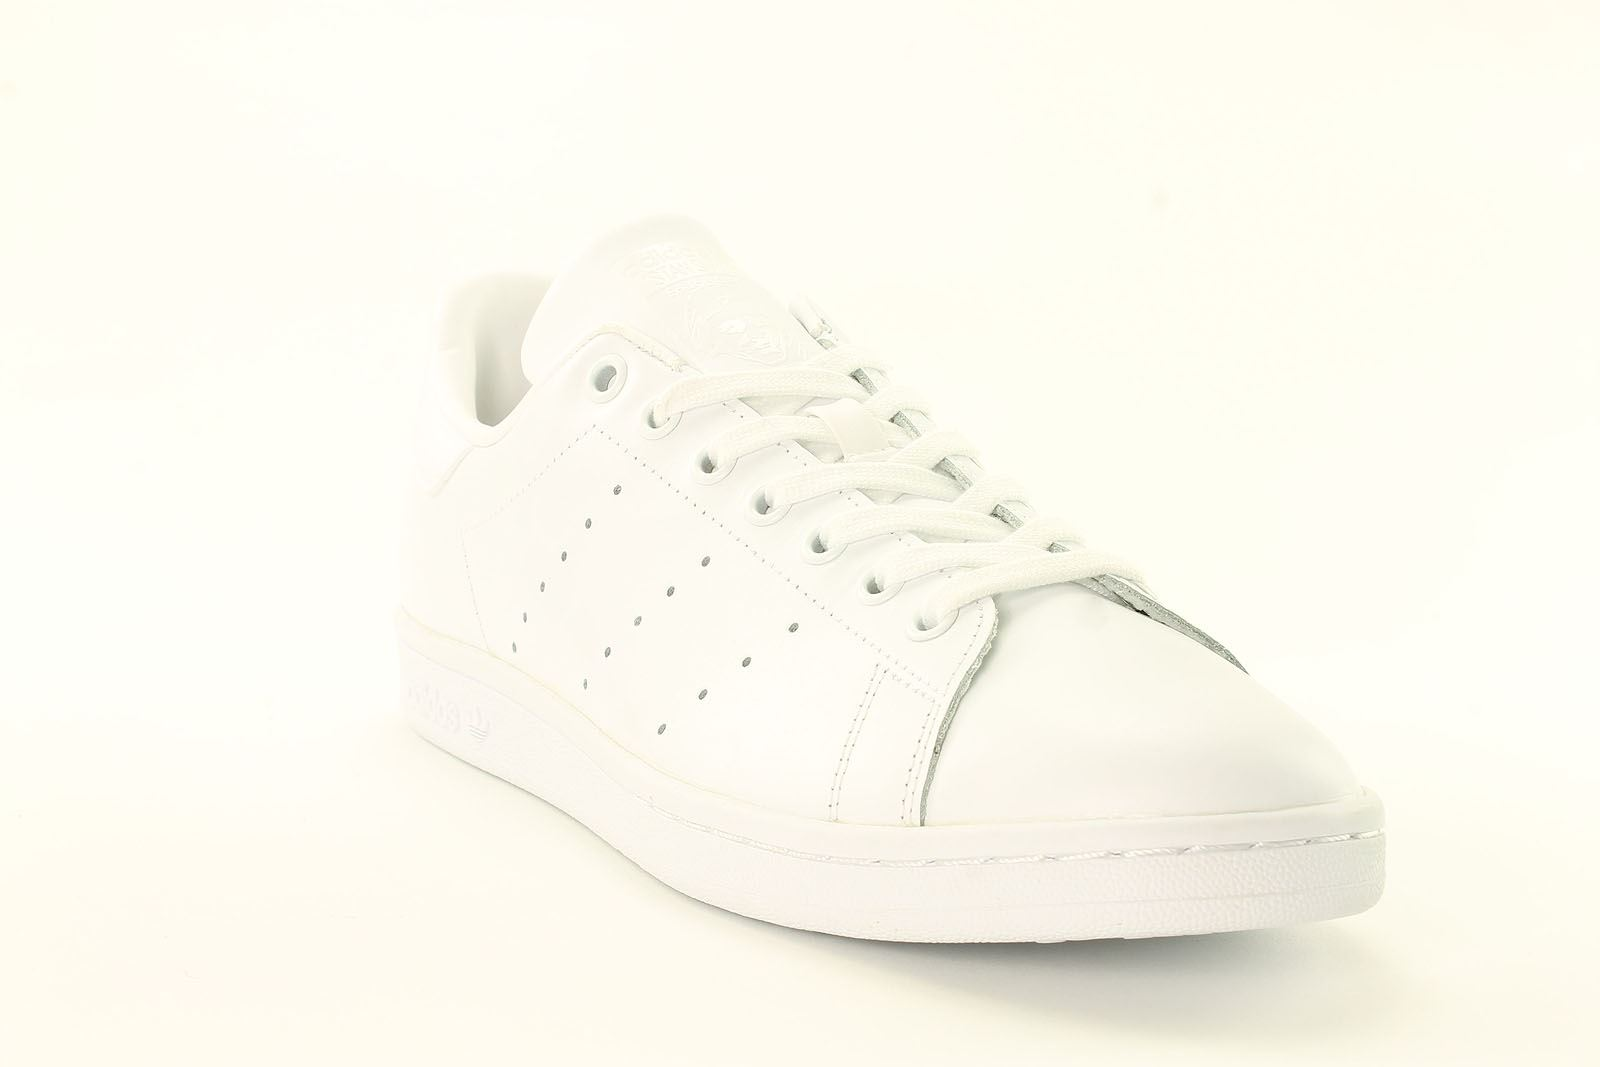 info for 39aec c6d08 adidas-Stan-Smith-Mens-Trainers-4-Colours-Originals-